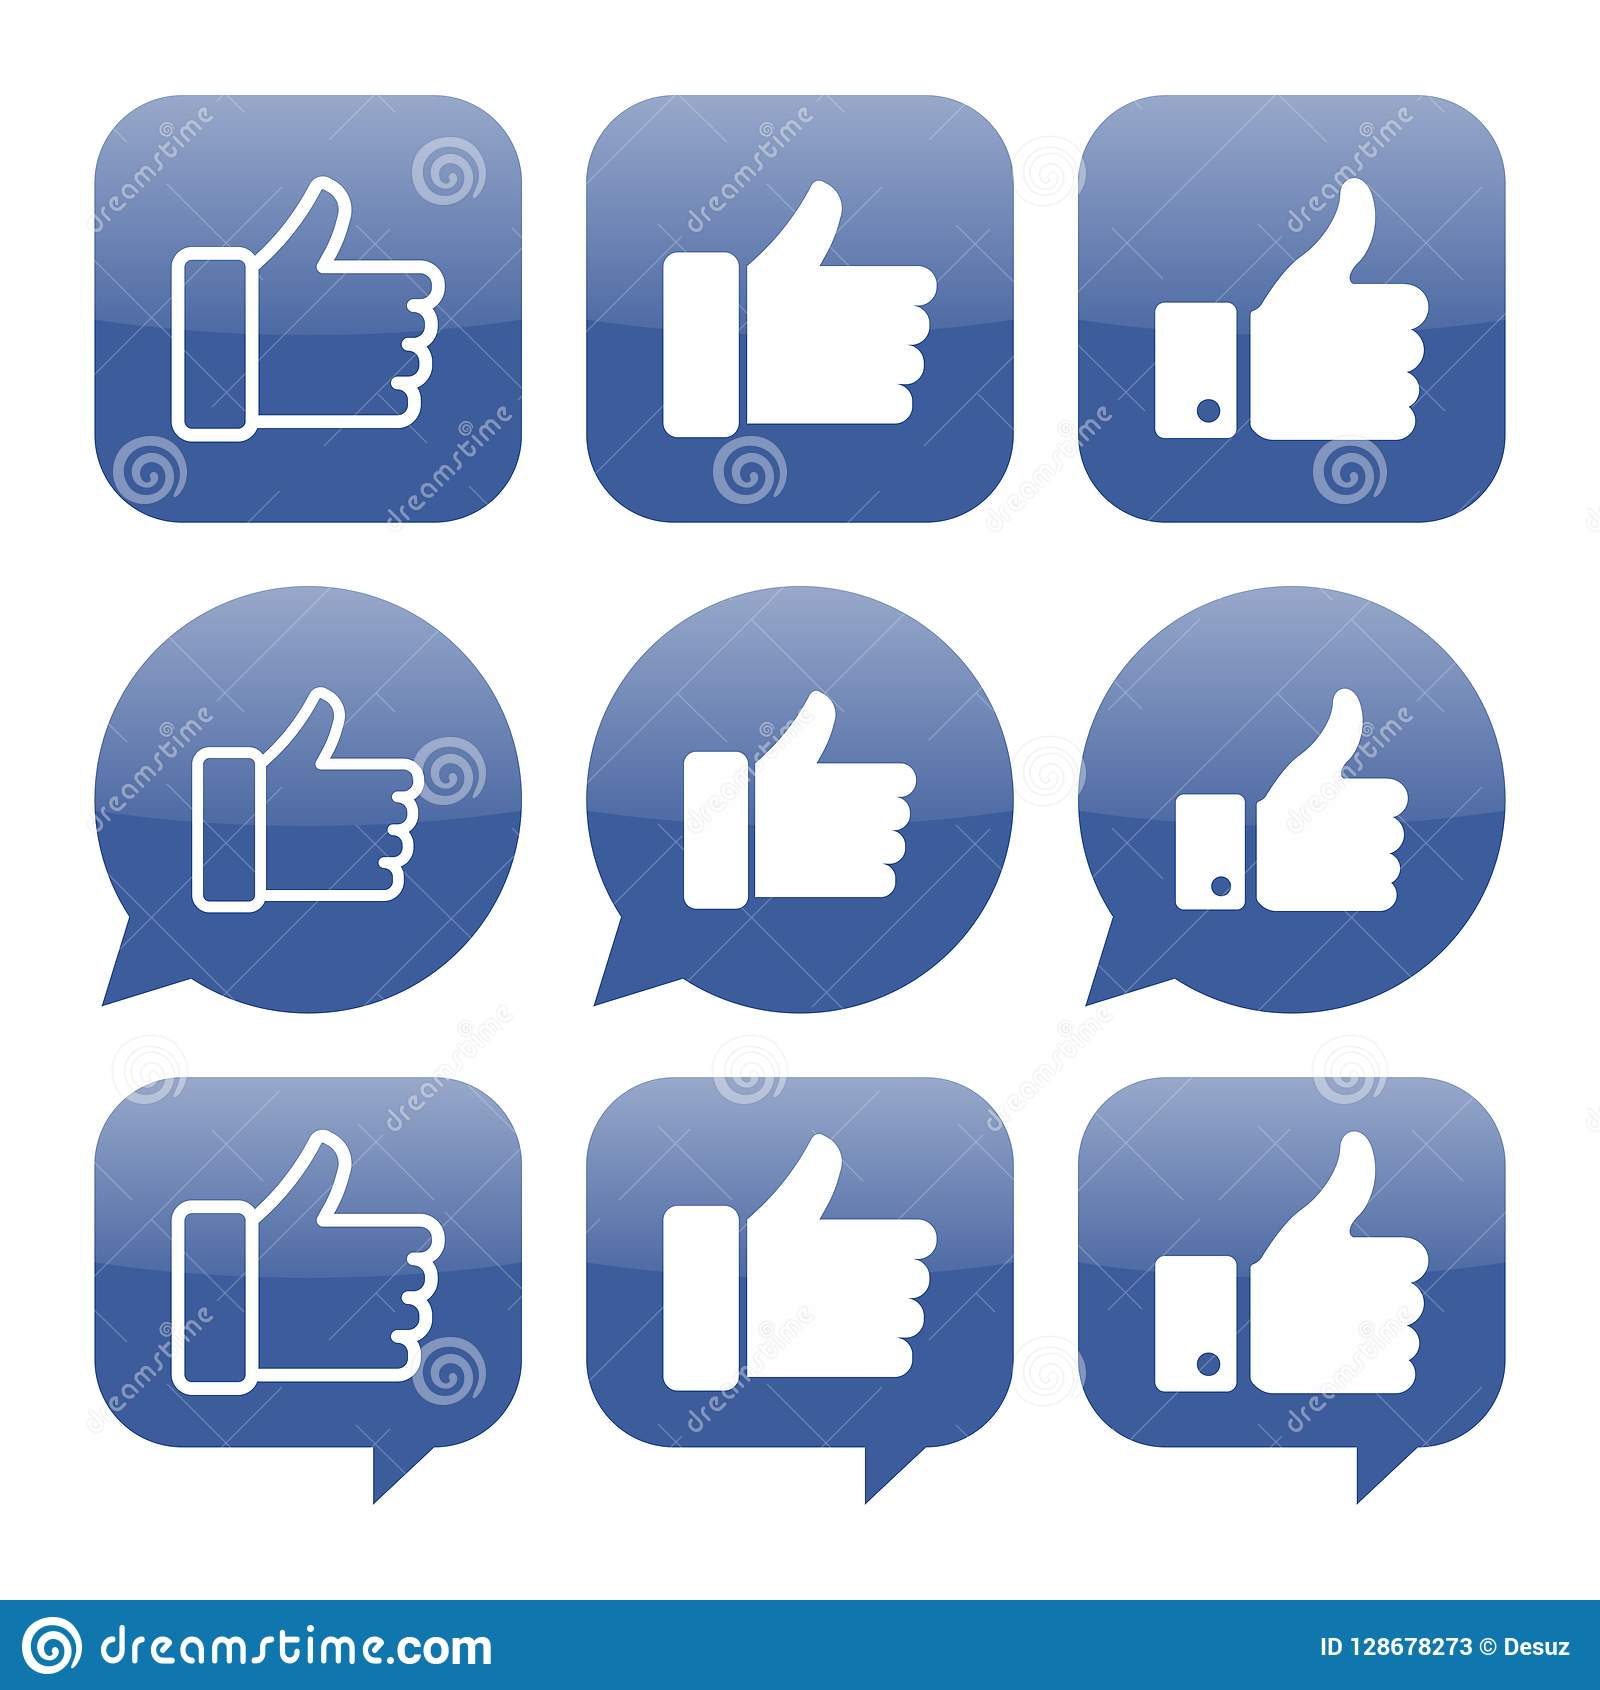 Facebook like icon vector collection